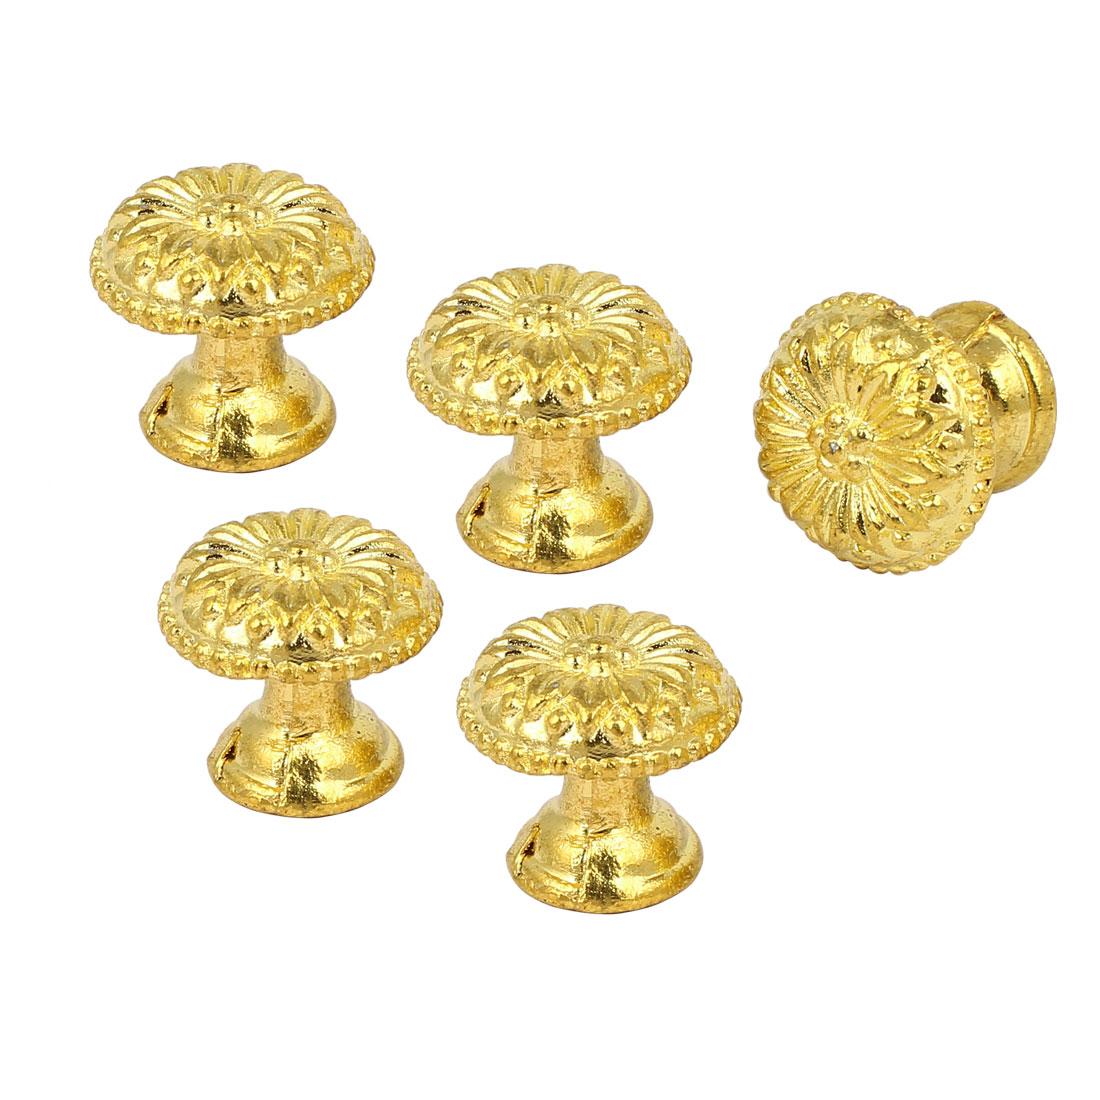 Cabinet Drawer Dresser Door Single Hole Round Pull Knob Gold Tone 5PCS